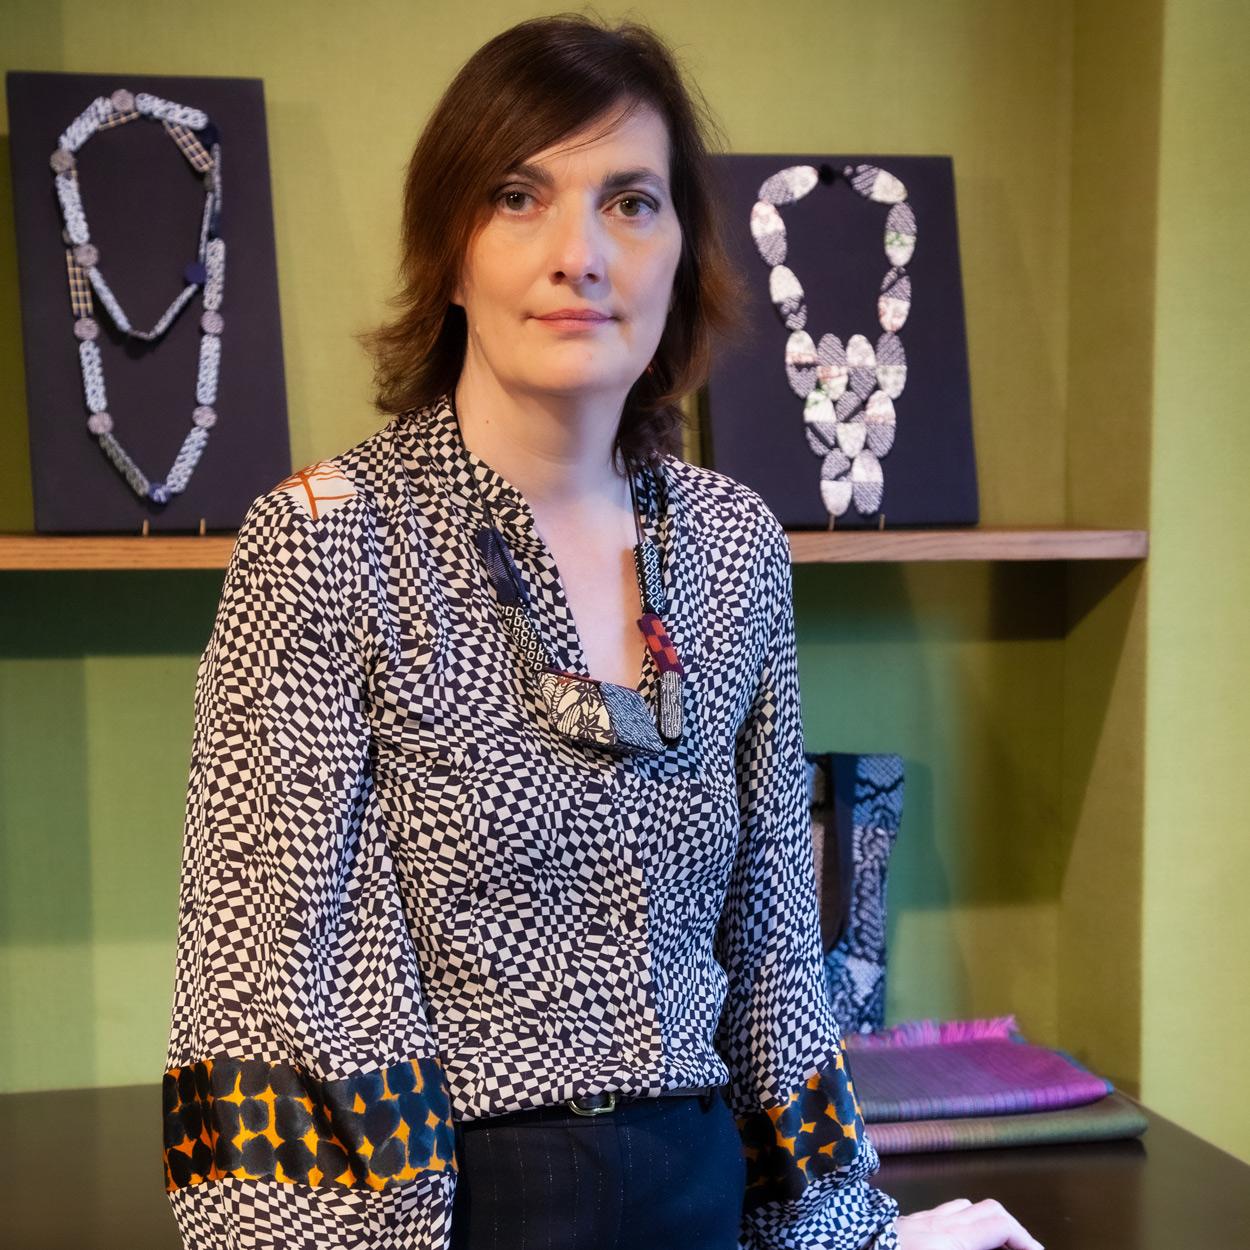 Valerie-Hangel-Styliste-Bijou-Textile-Galerie-H-Carouge